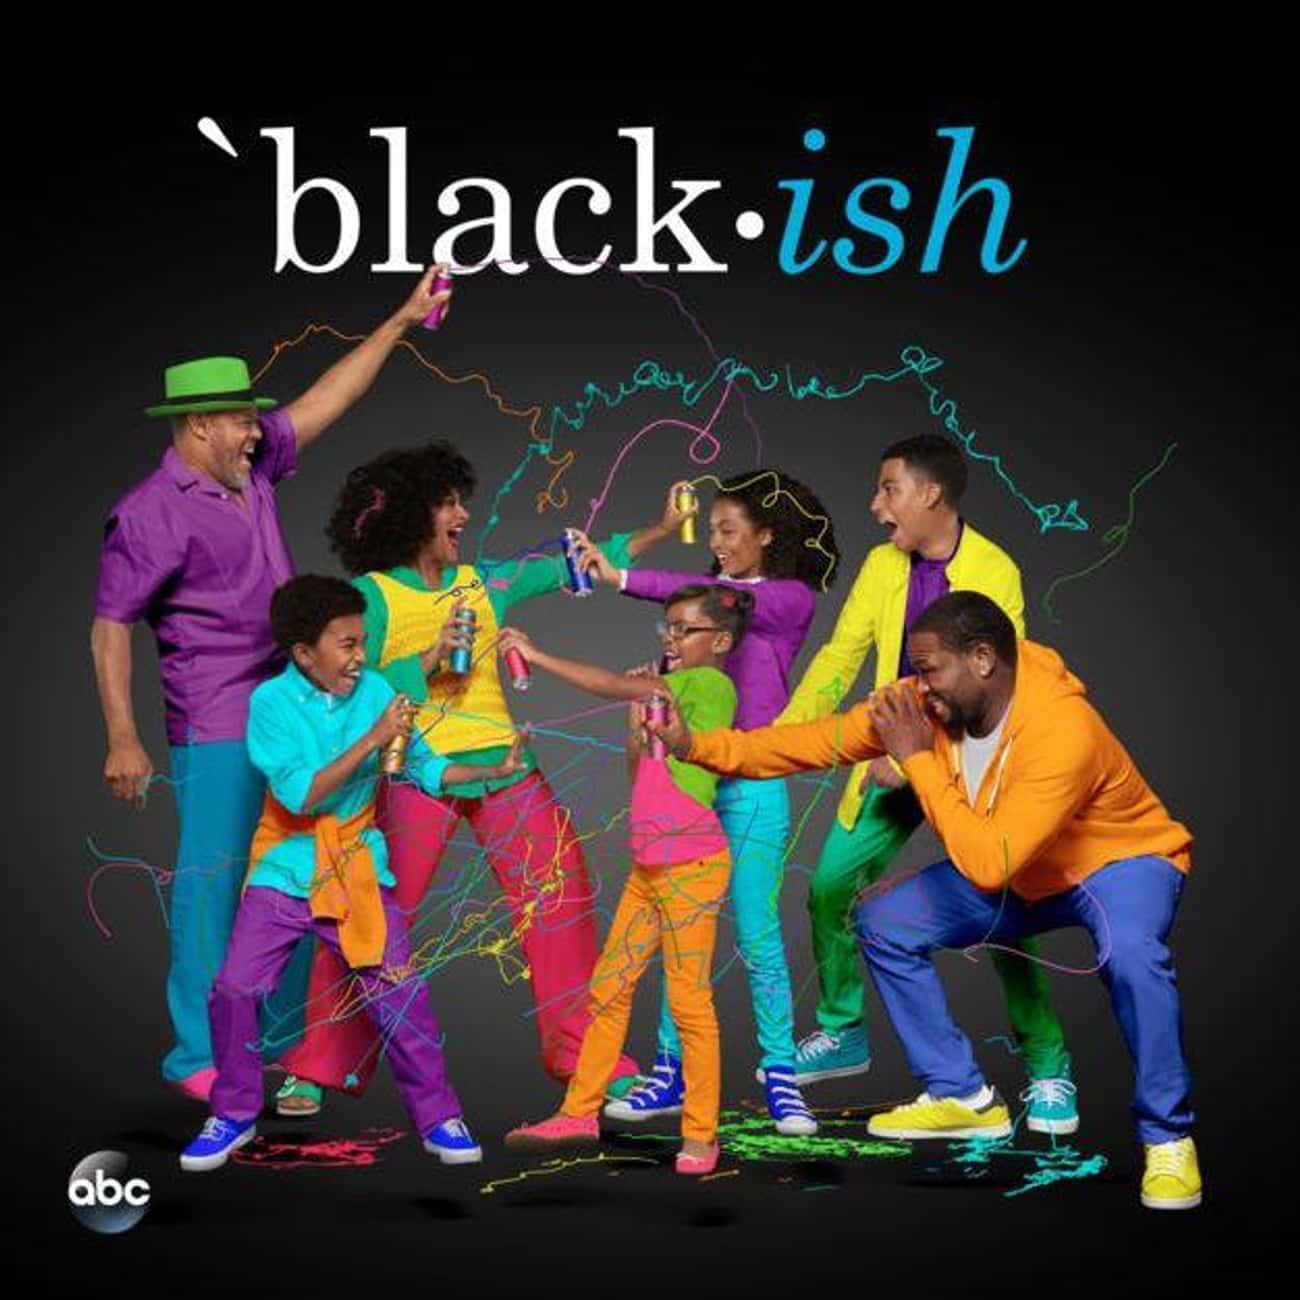 Blackish - Season 2 is listed (or ranked) 2 on the list Ranking the Best Seasons of 'Black-ish'